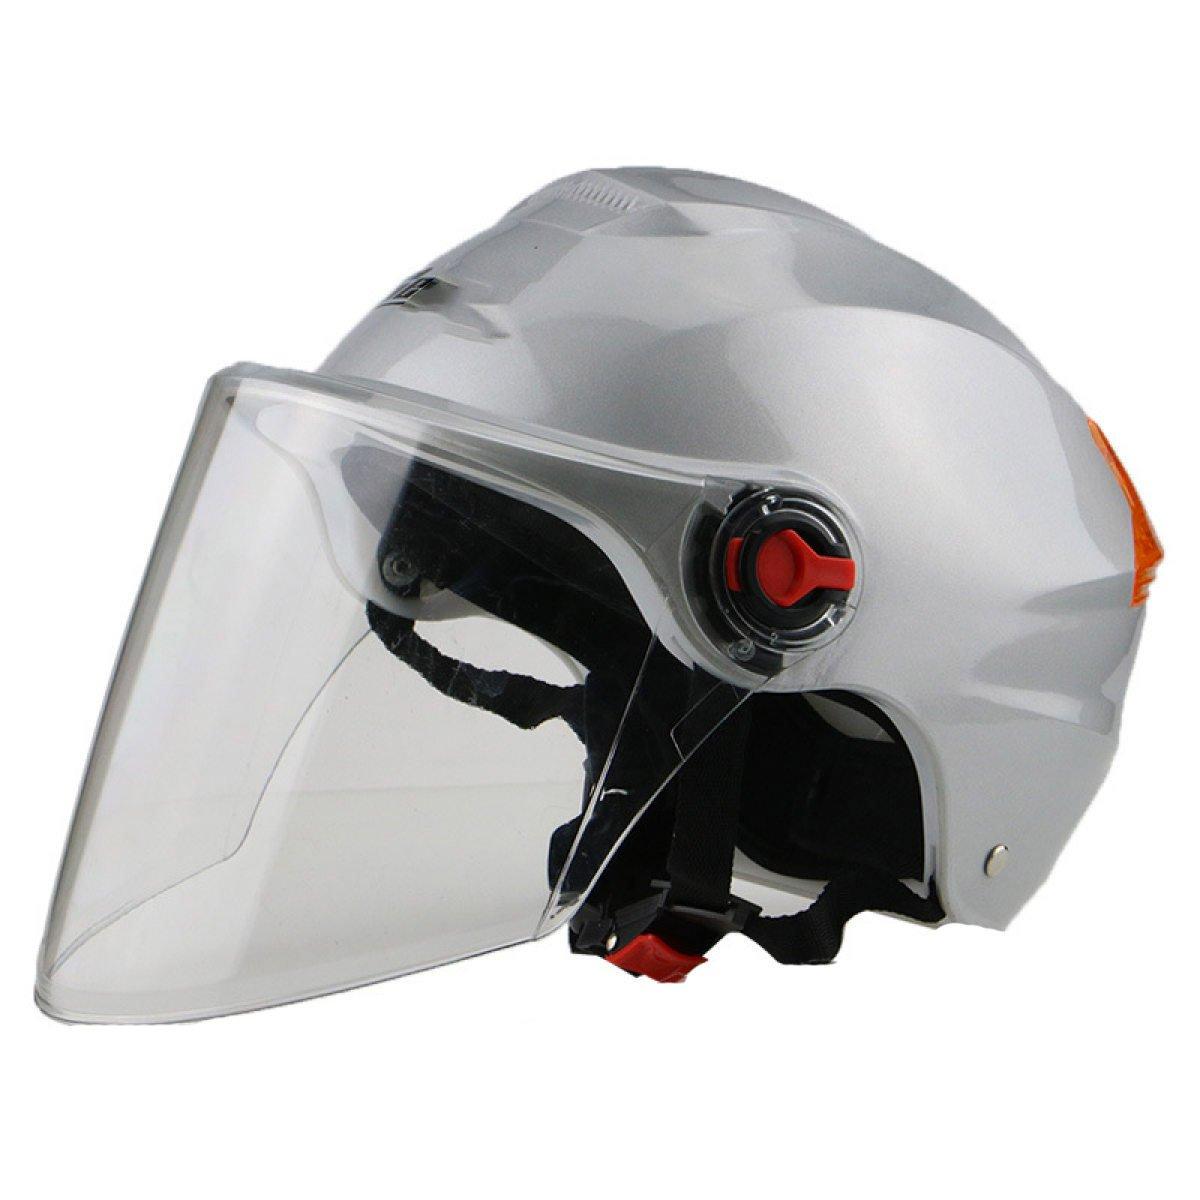 TZQ Full Helm Winter Warm Ausgesetzt Helm Motorrad Männer Lady Off Road Racing Cap